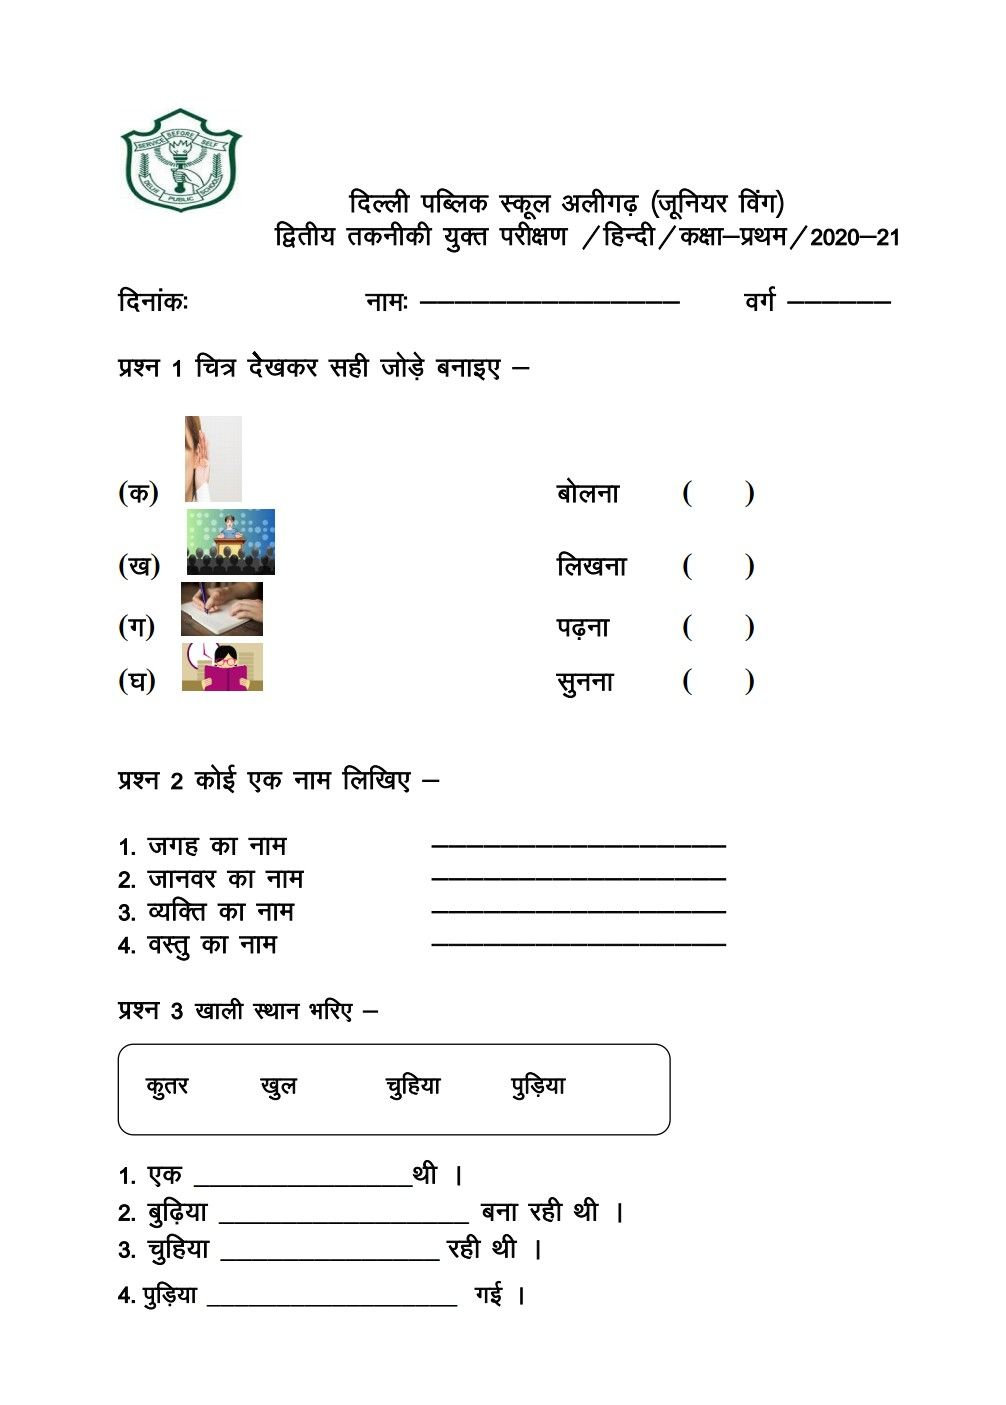 Hindi worksheet for grade 1   1st grade worksheets [ 1405 x 1006 Pixel ]